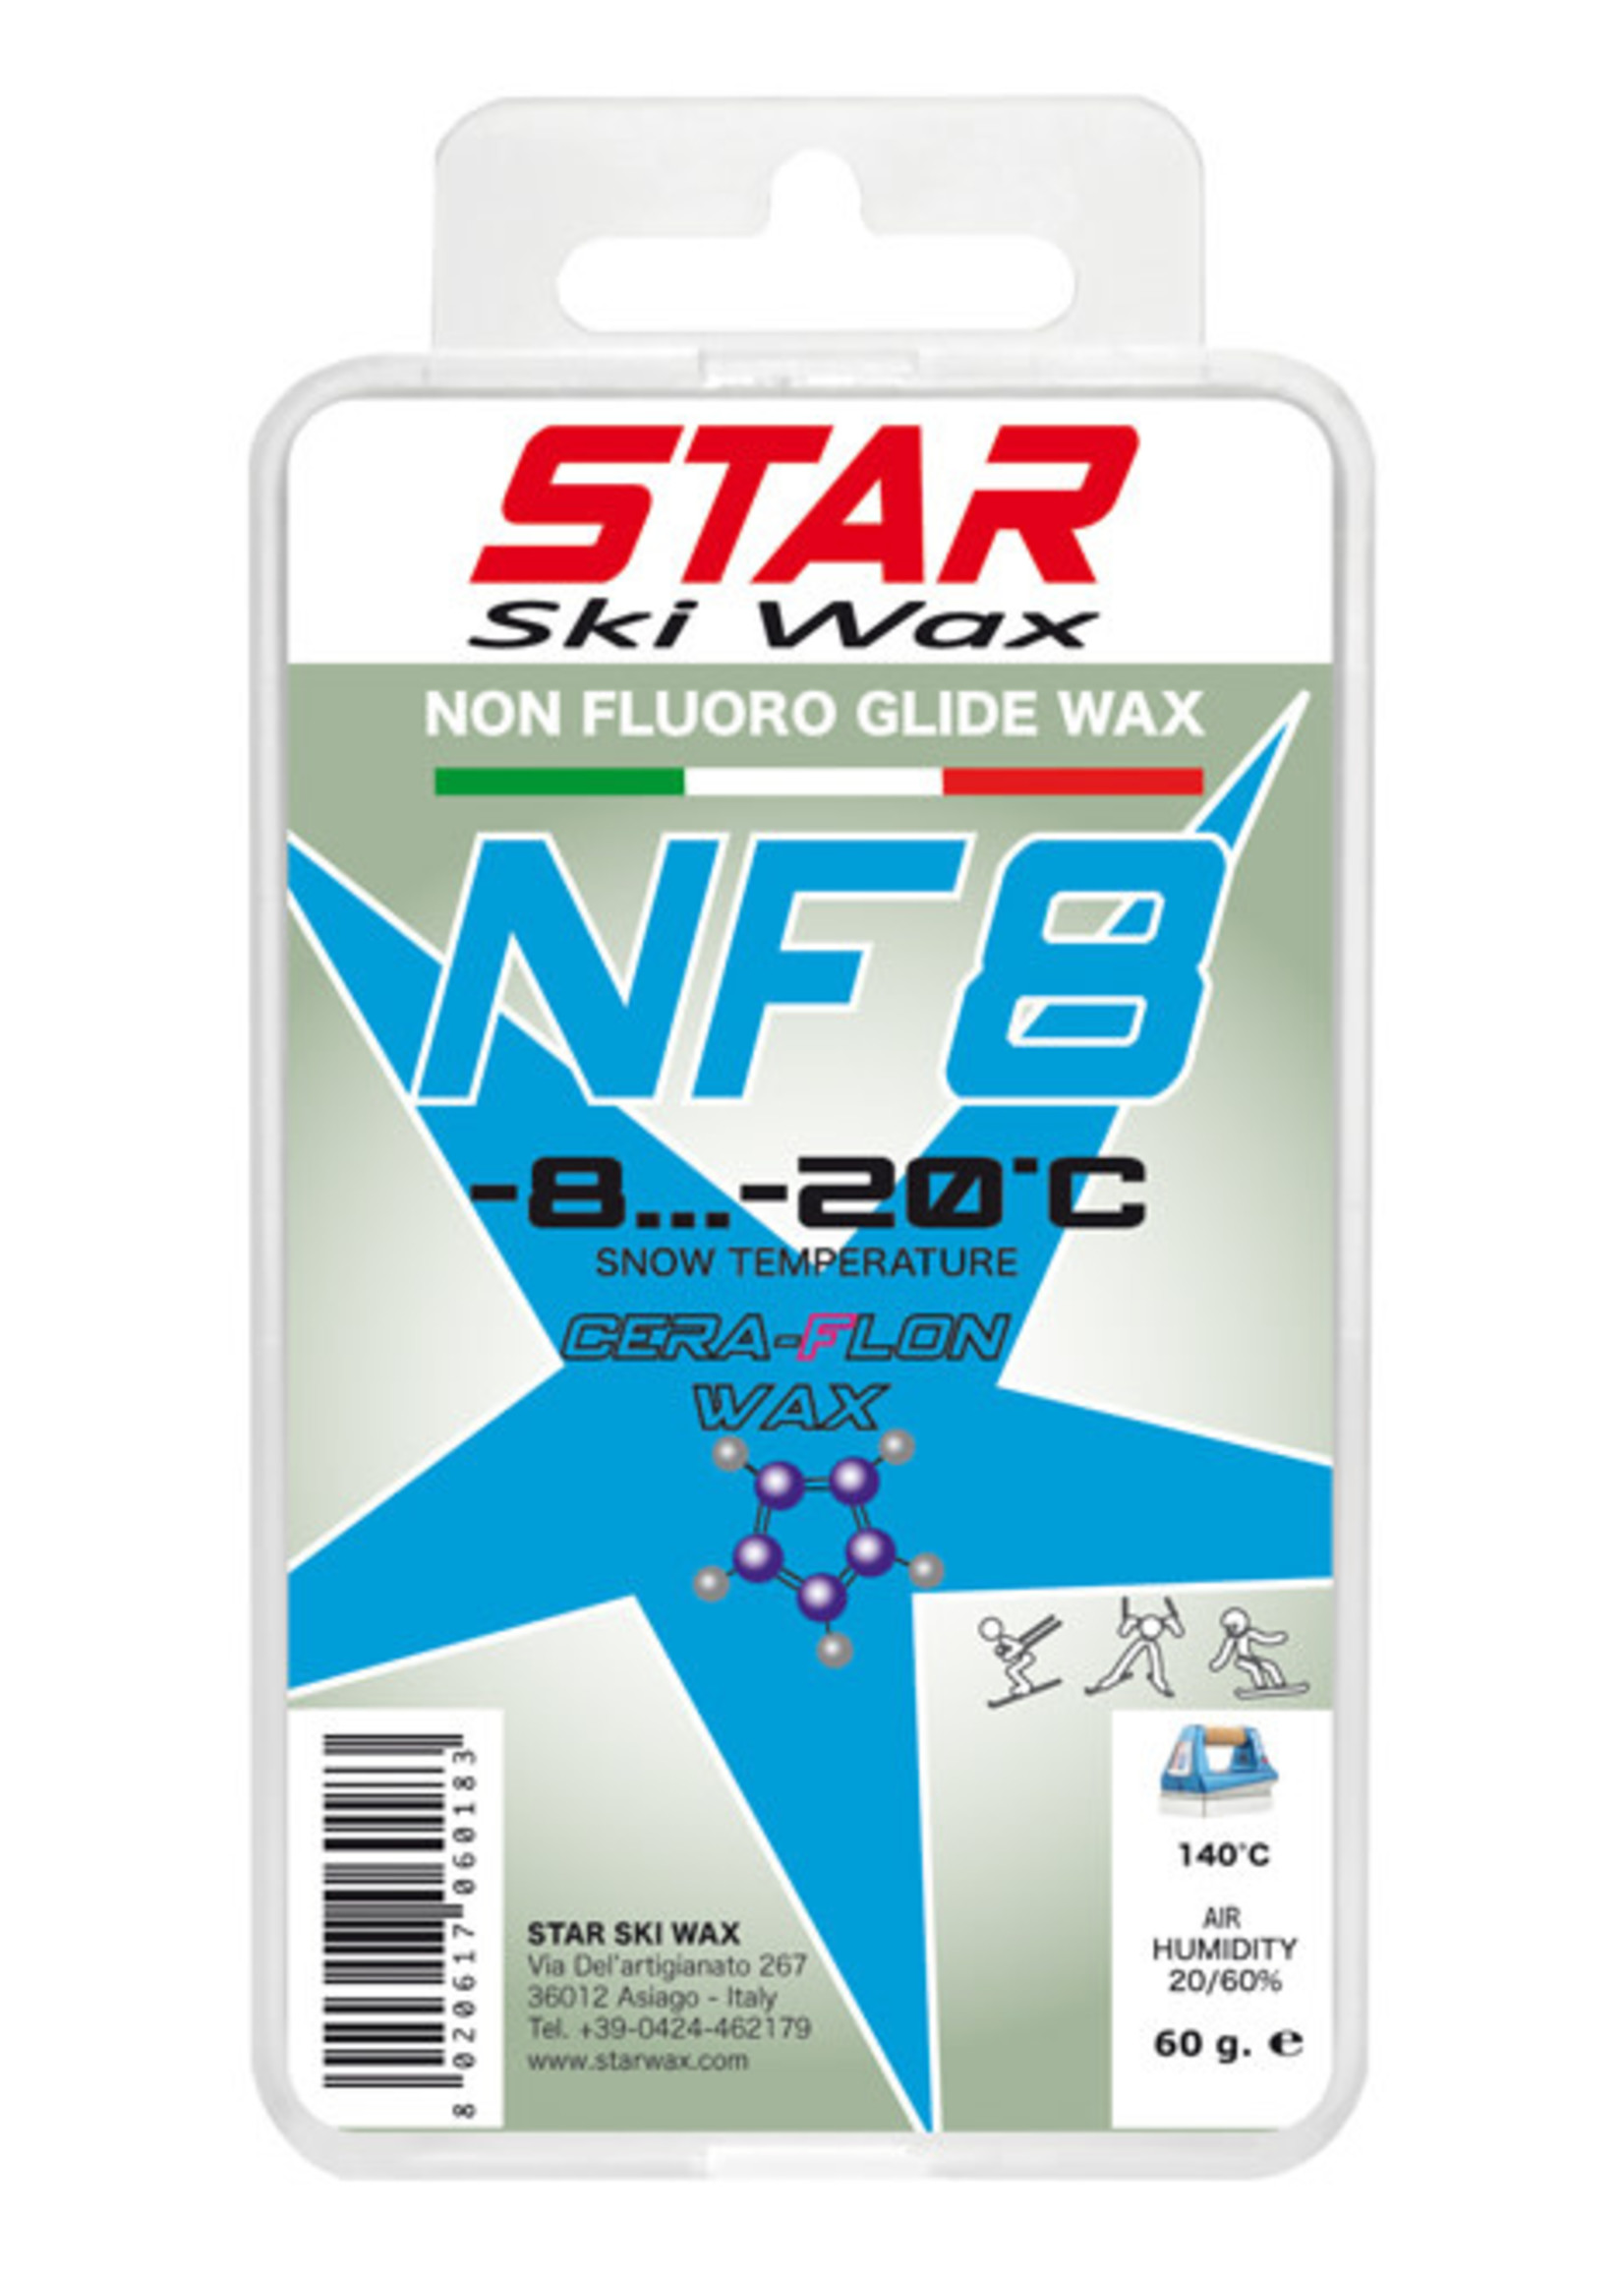 NF8 Cera-Flon 60g